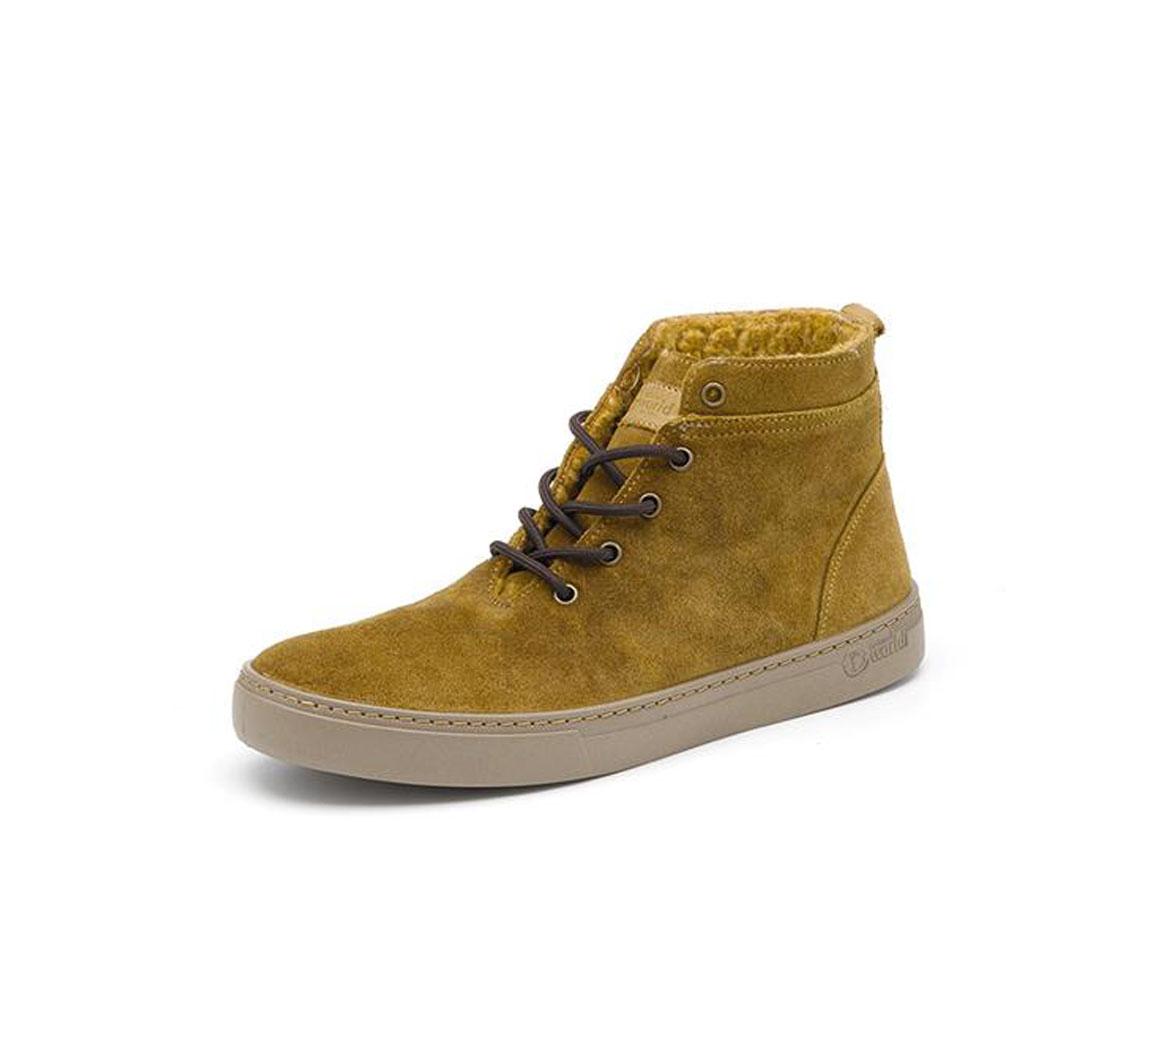 Chaussure de ville homme montante Bota Suede Wool Tintado